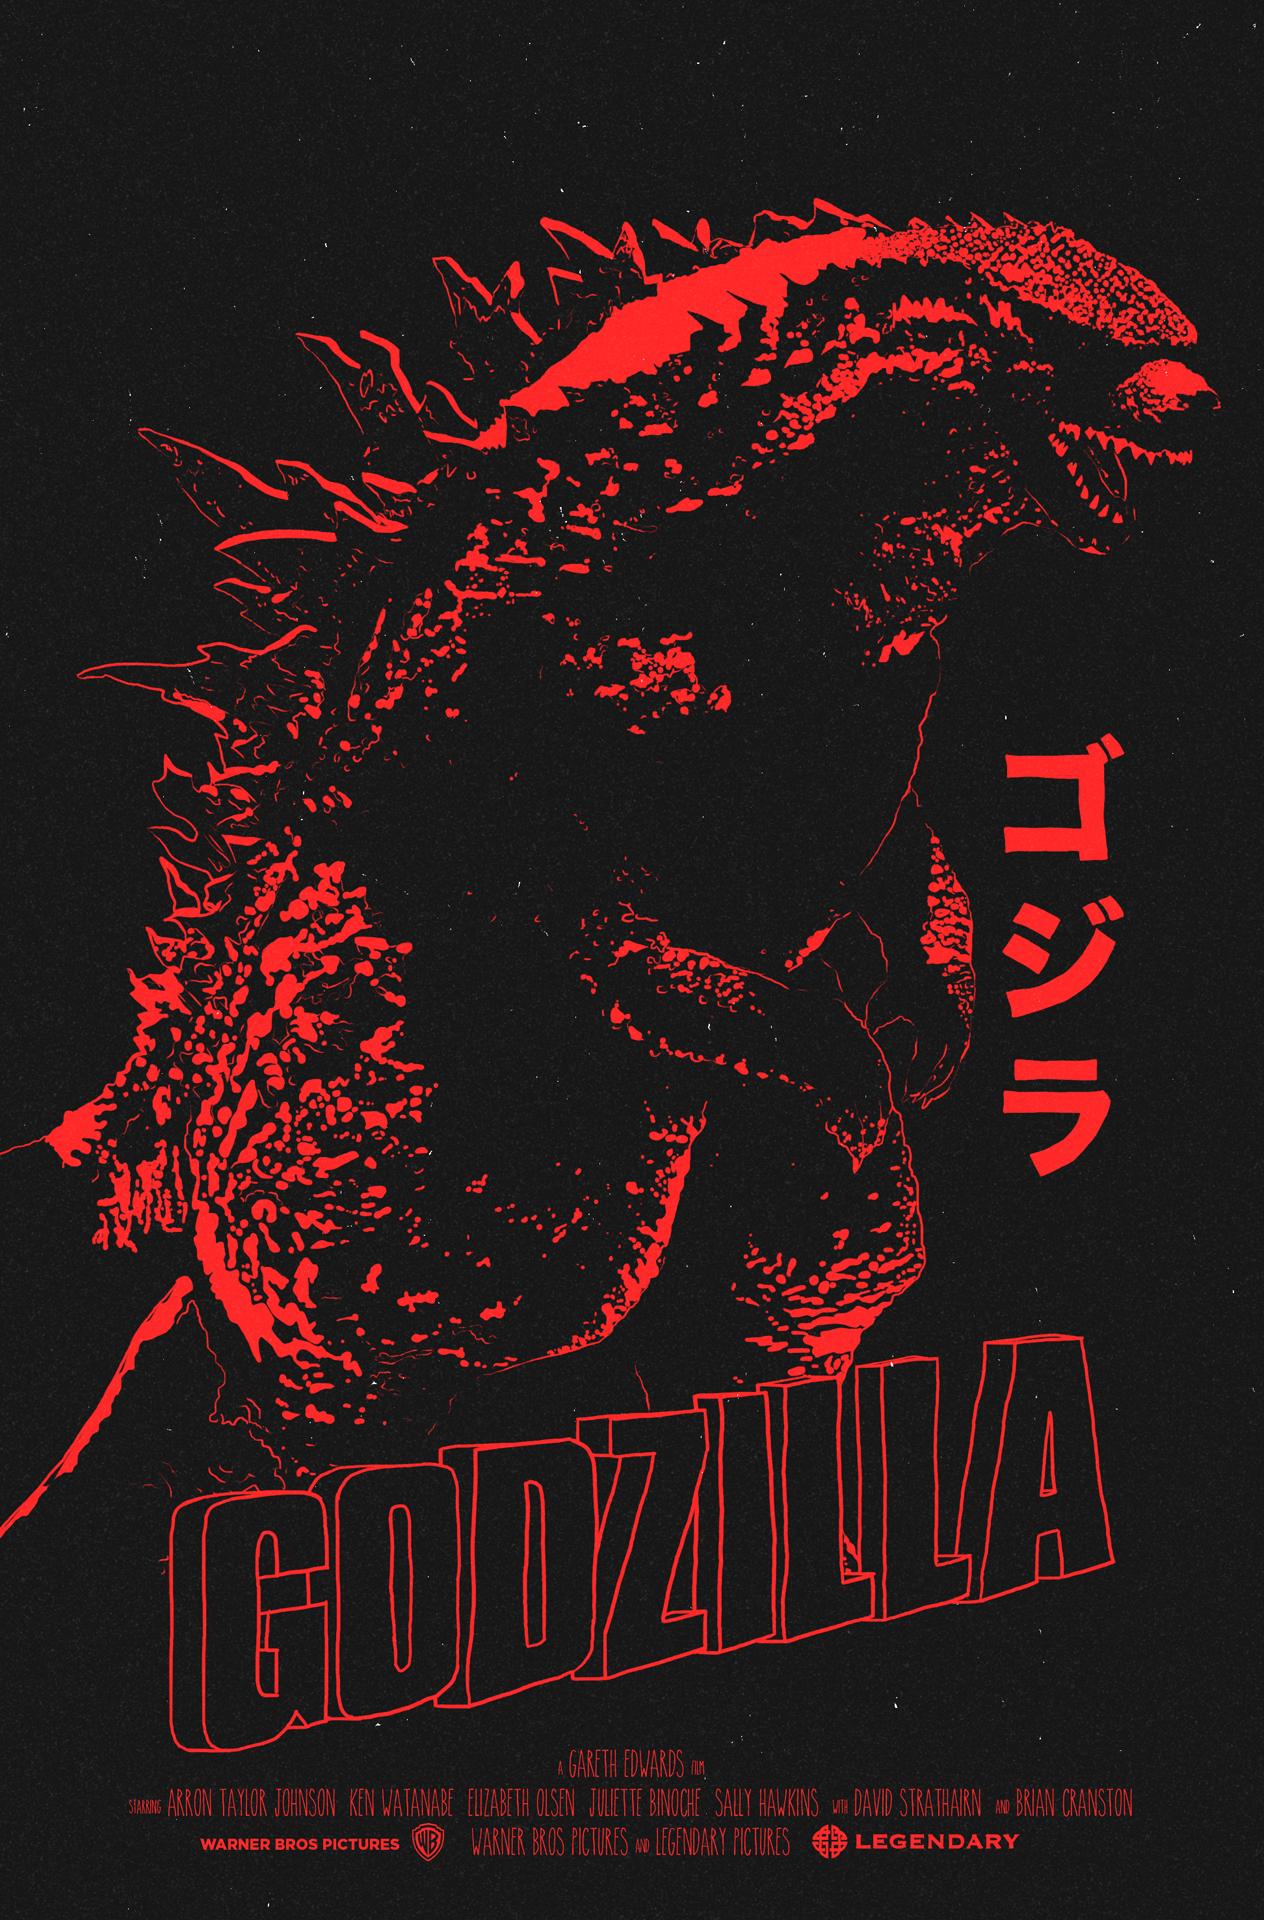 Godzilla_red_04.jpg